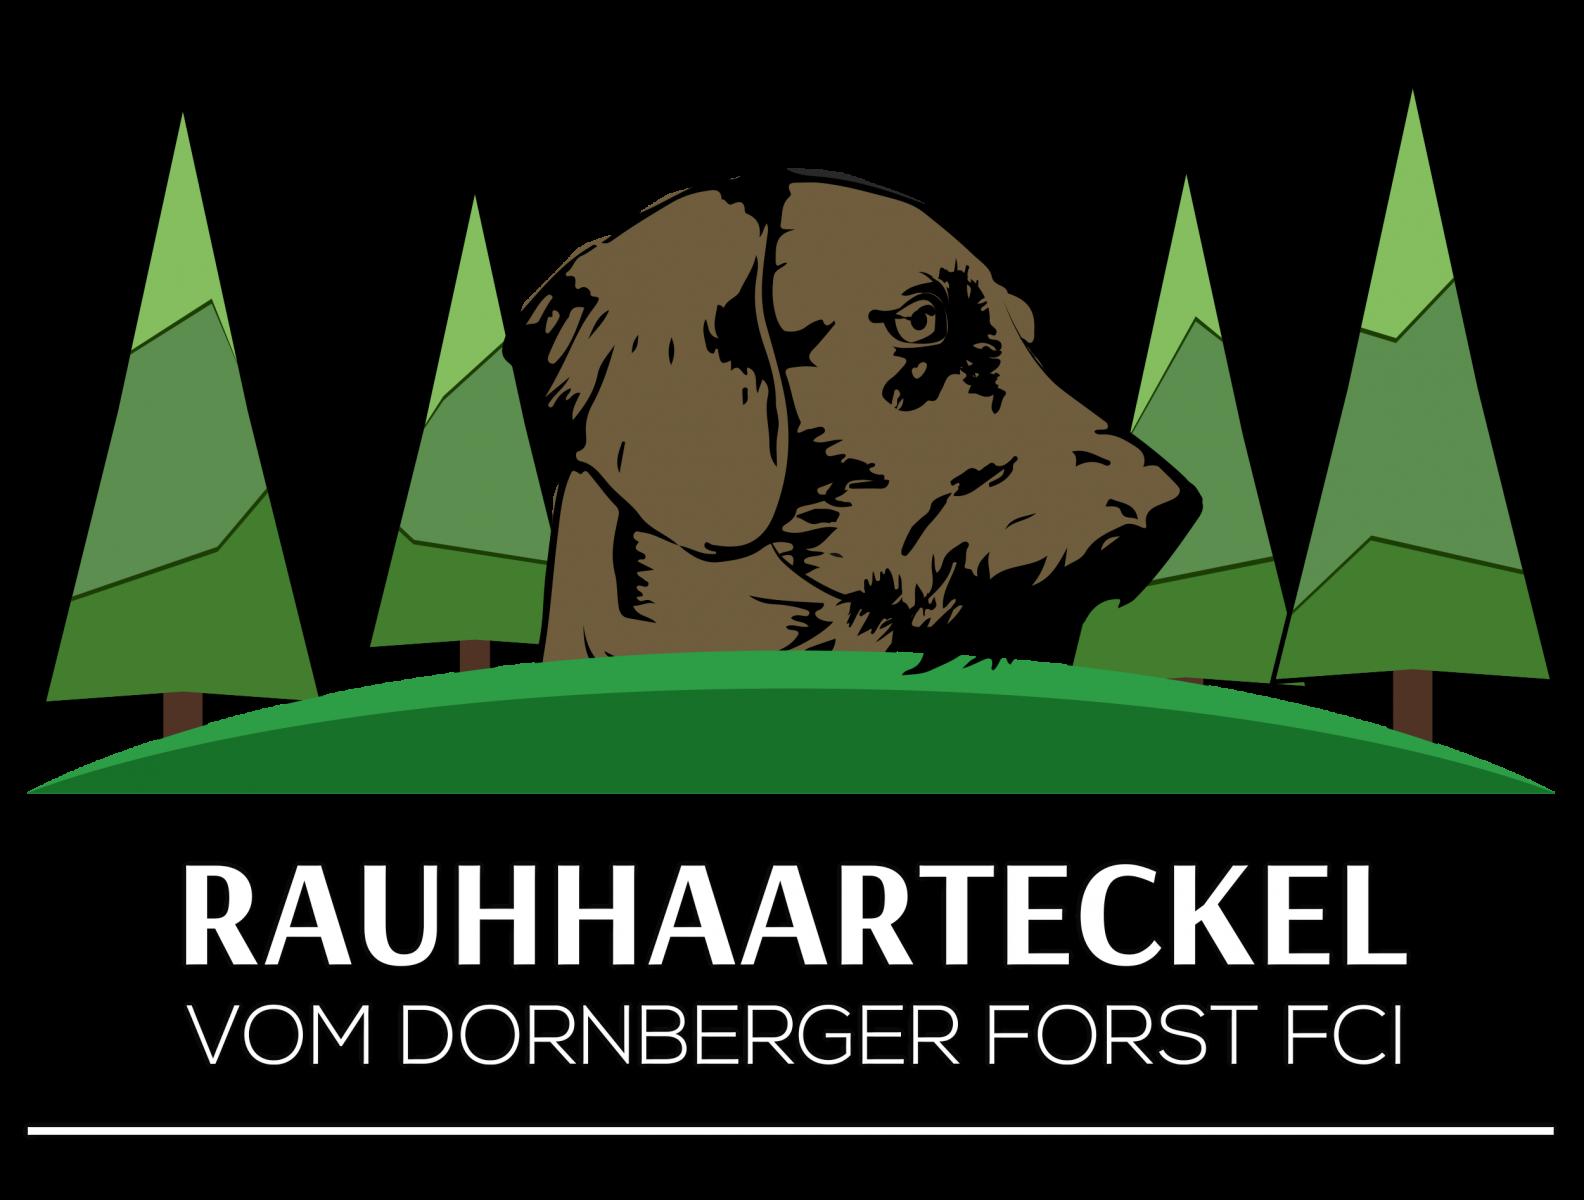 Teckel vom Dornberger Forst